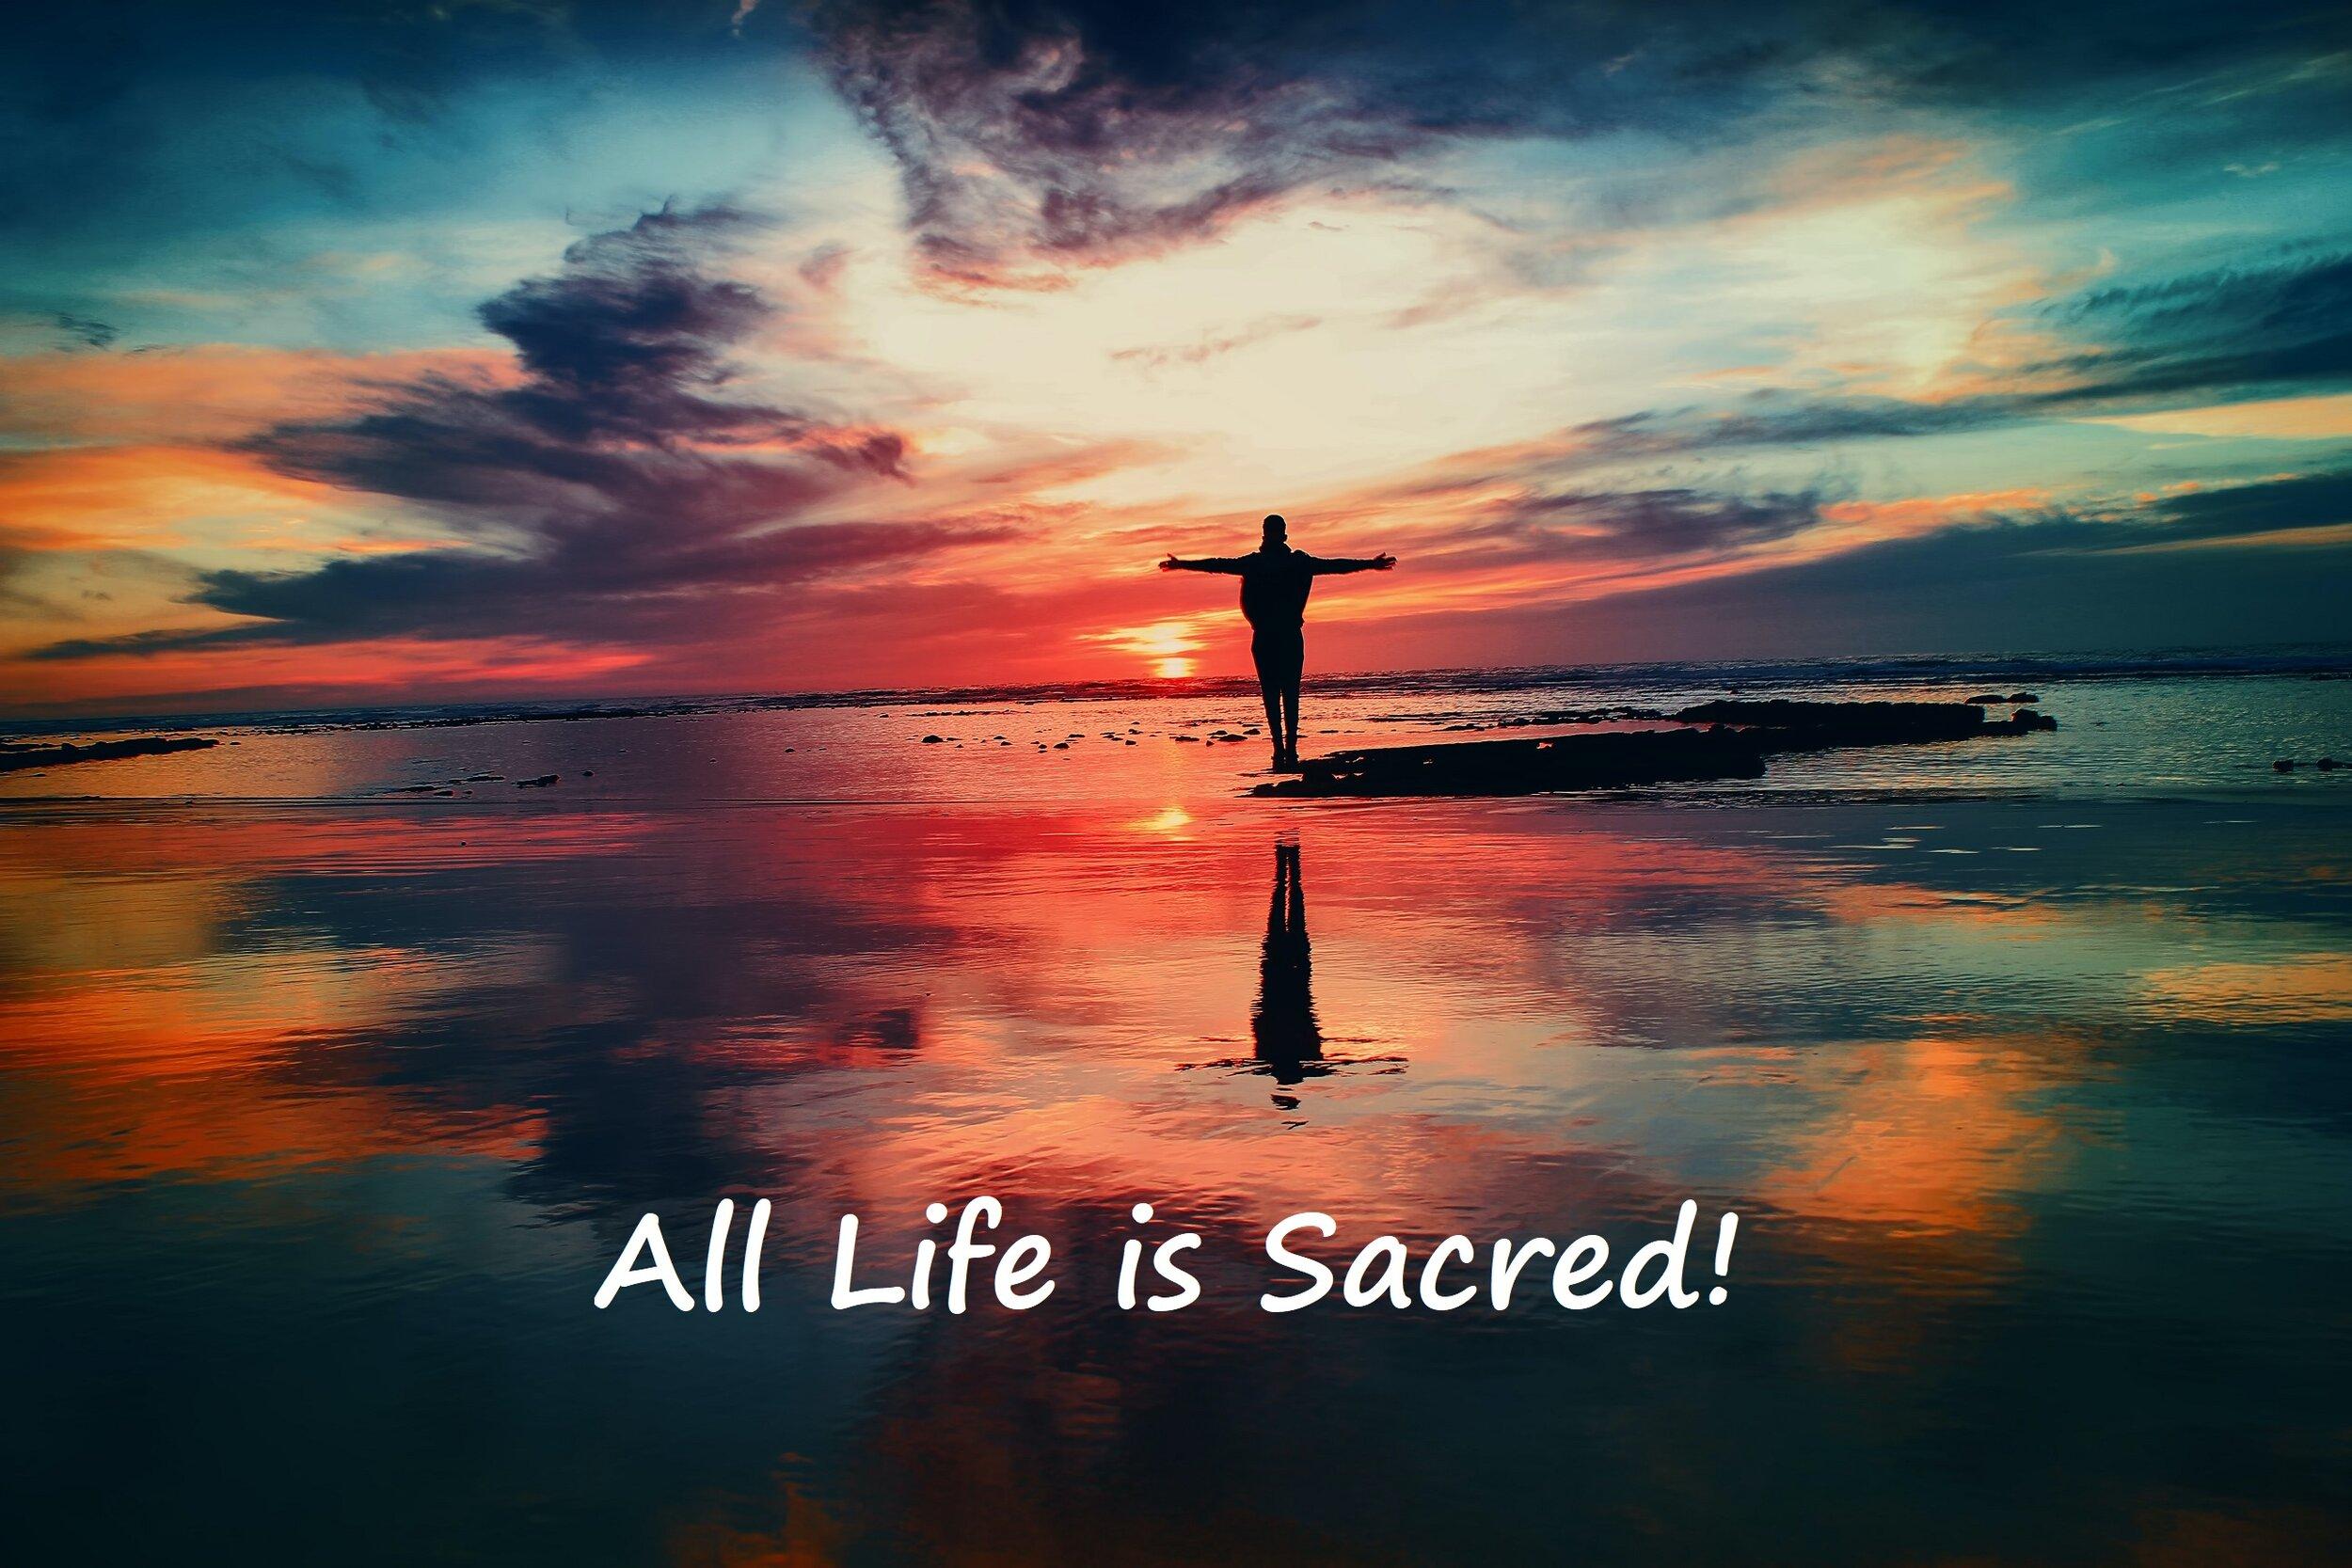 All life is sacred.jpg